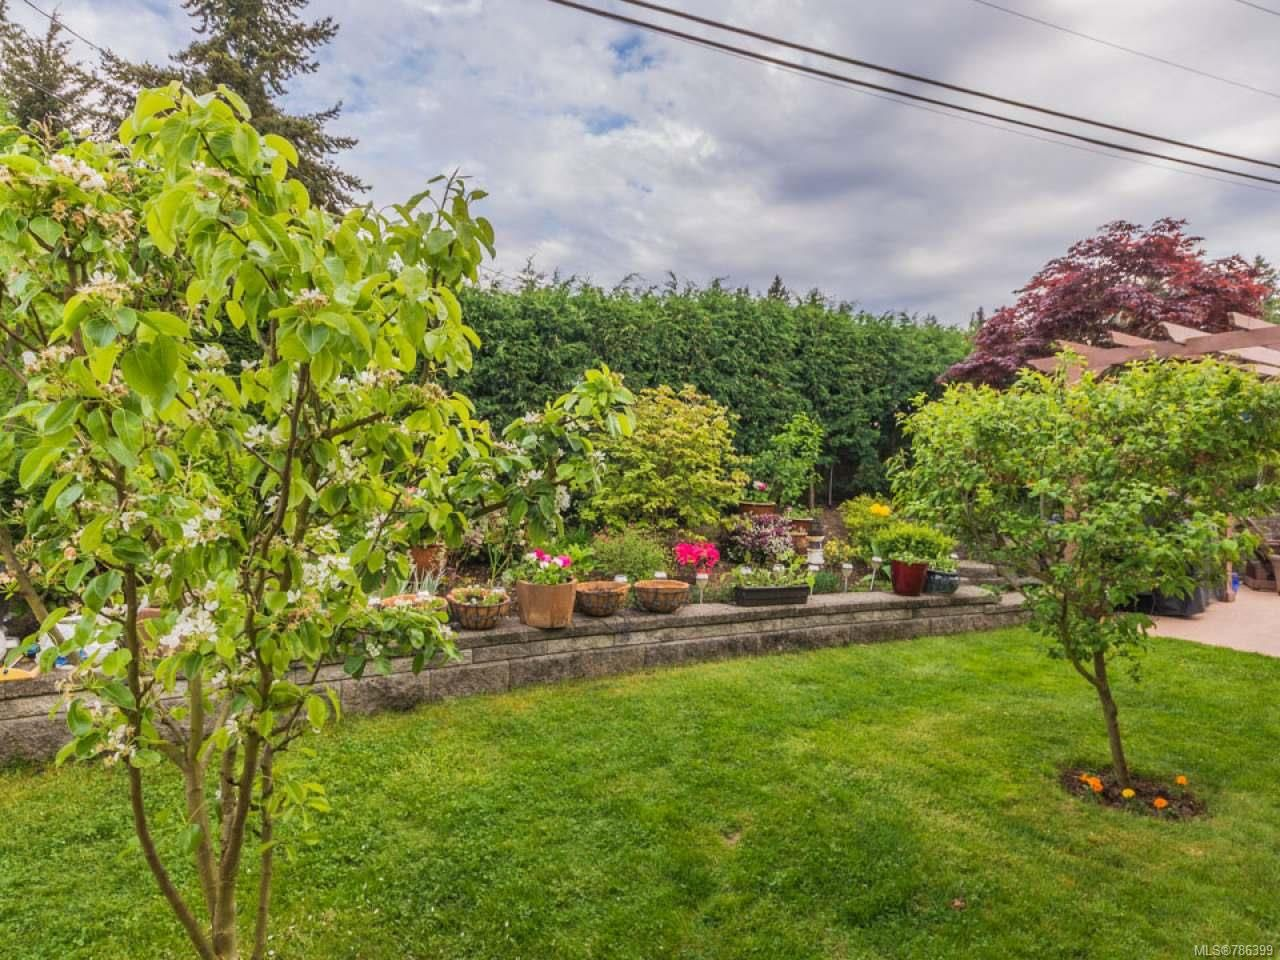 Photo 28: Photos: 5371 HIGHRIDGE PLACE in NANAIMO: Na North Nanaimo House for sale (Nanaimo)  : MLS®# 786399